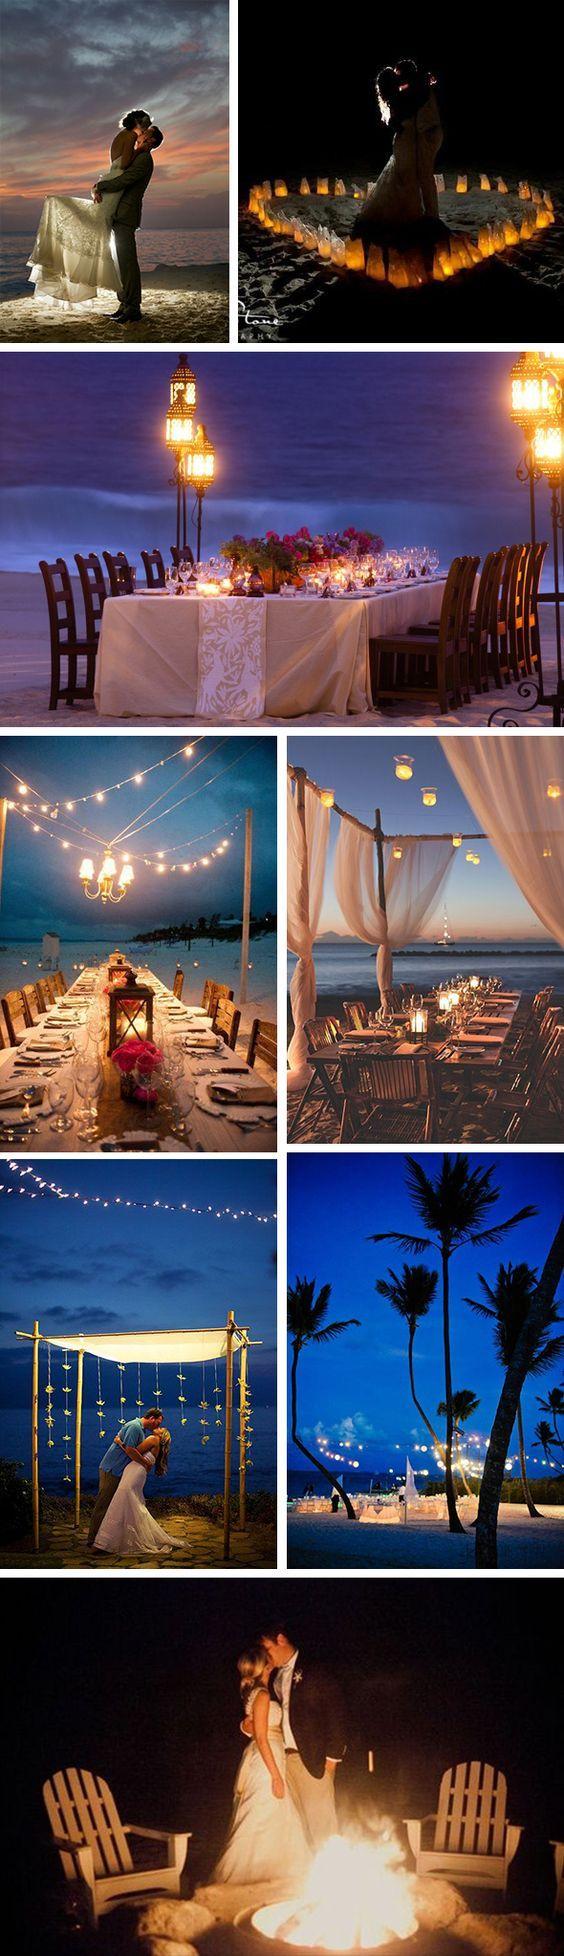 night beach weddings Beach Weddings at Night... destination wedding?